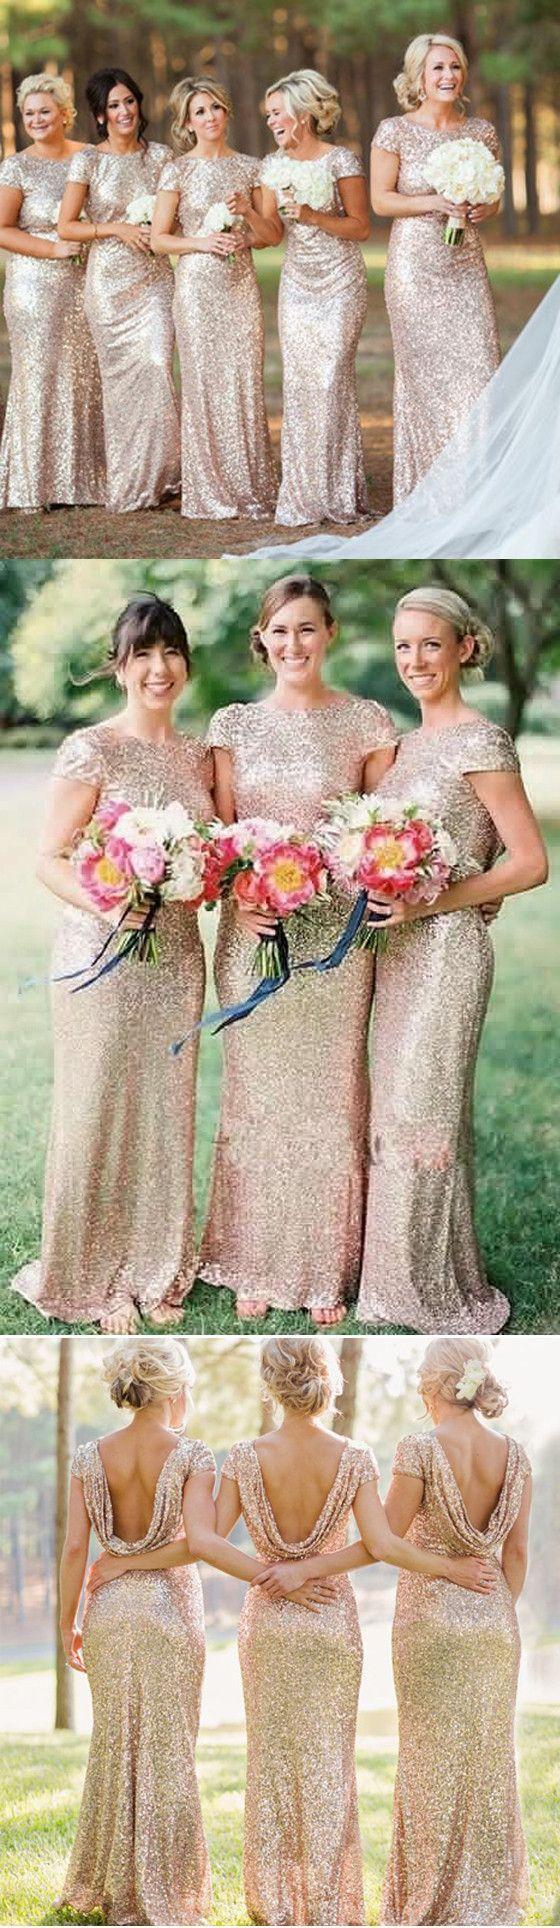 Gold sequin short sleeve mermaid long bridesmaid dresses bd